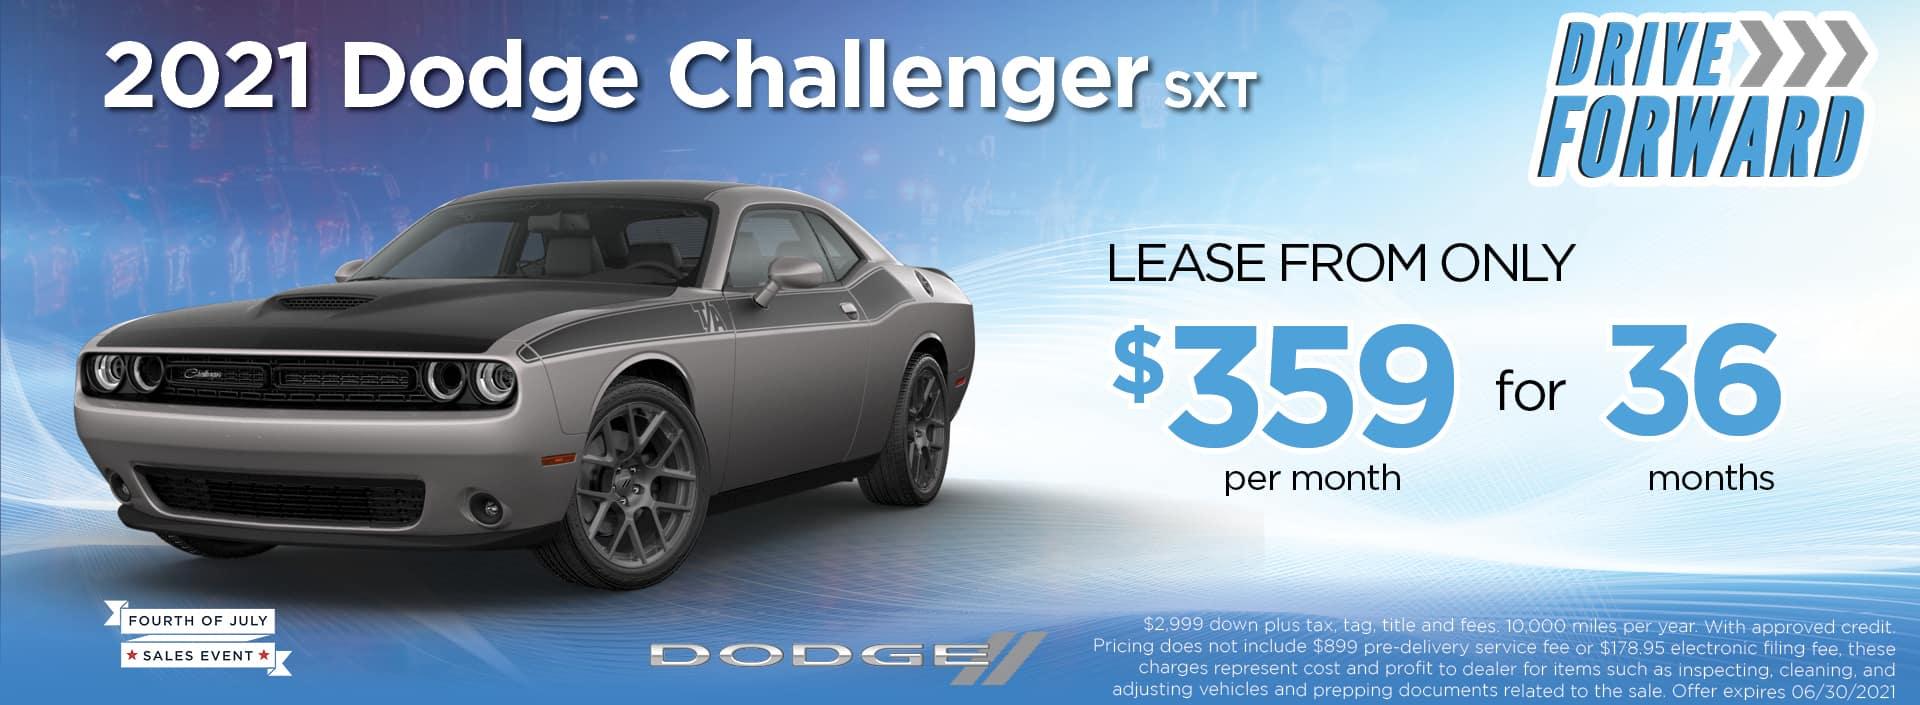 DF Challenger